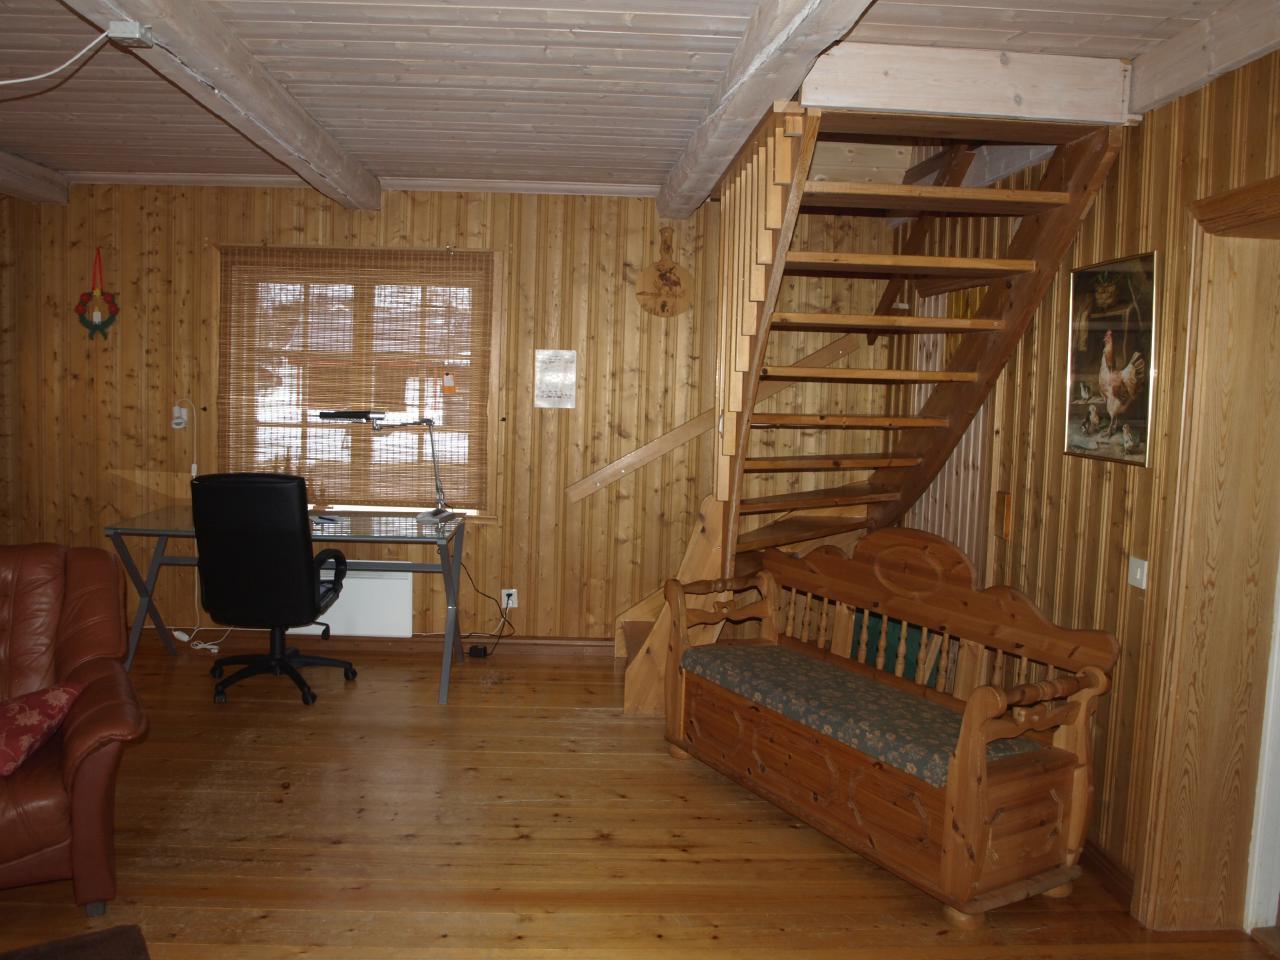 Ferienhaus Trollstuga (1079397), Gargnäs, Västerbottens län, Nordschweden, Schweden, Bild 6